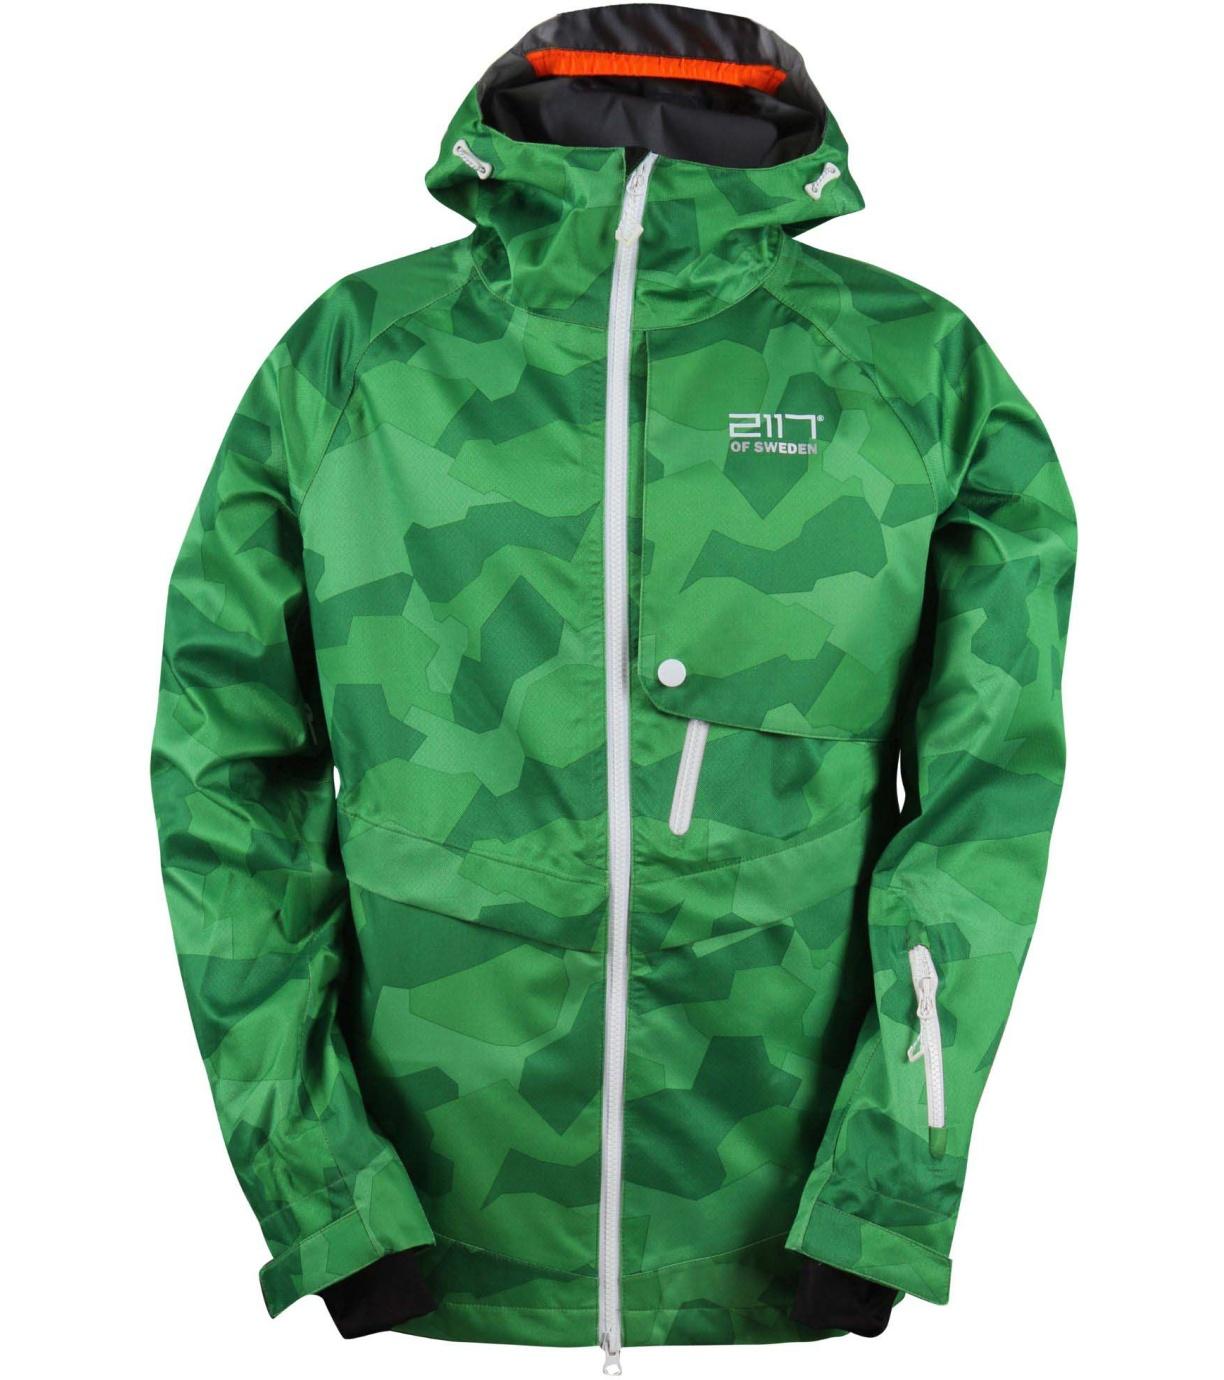 060 - Green